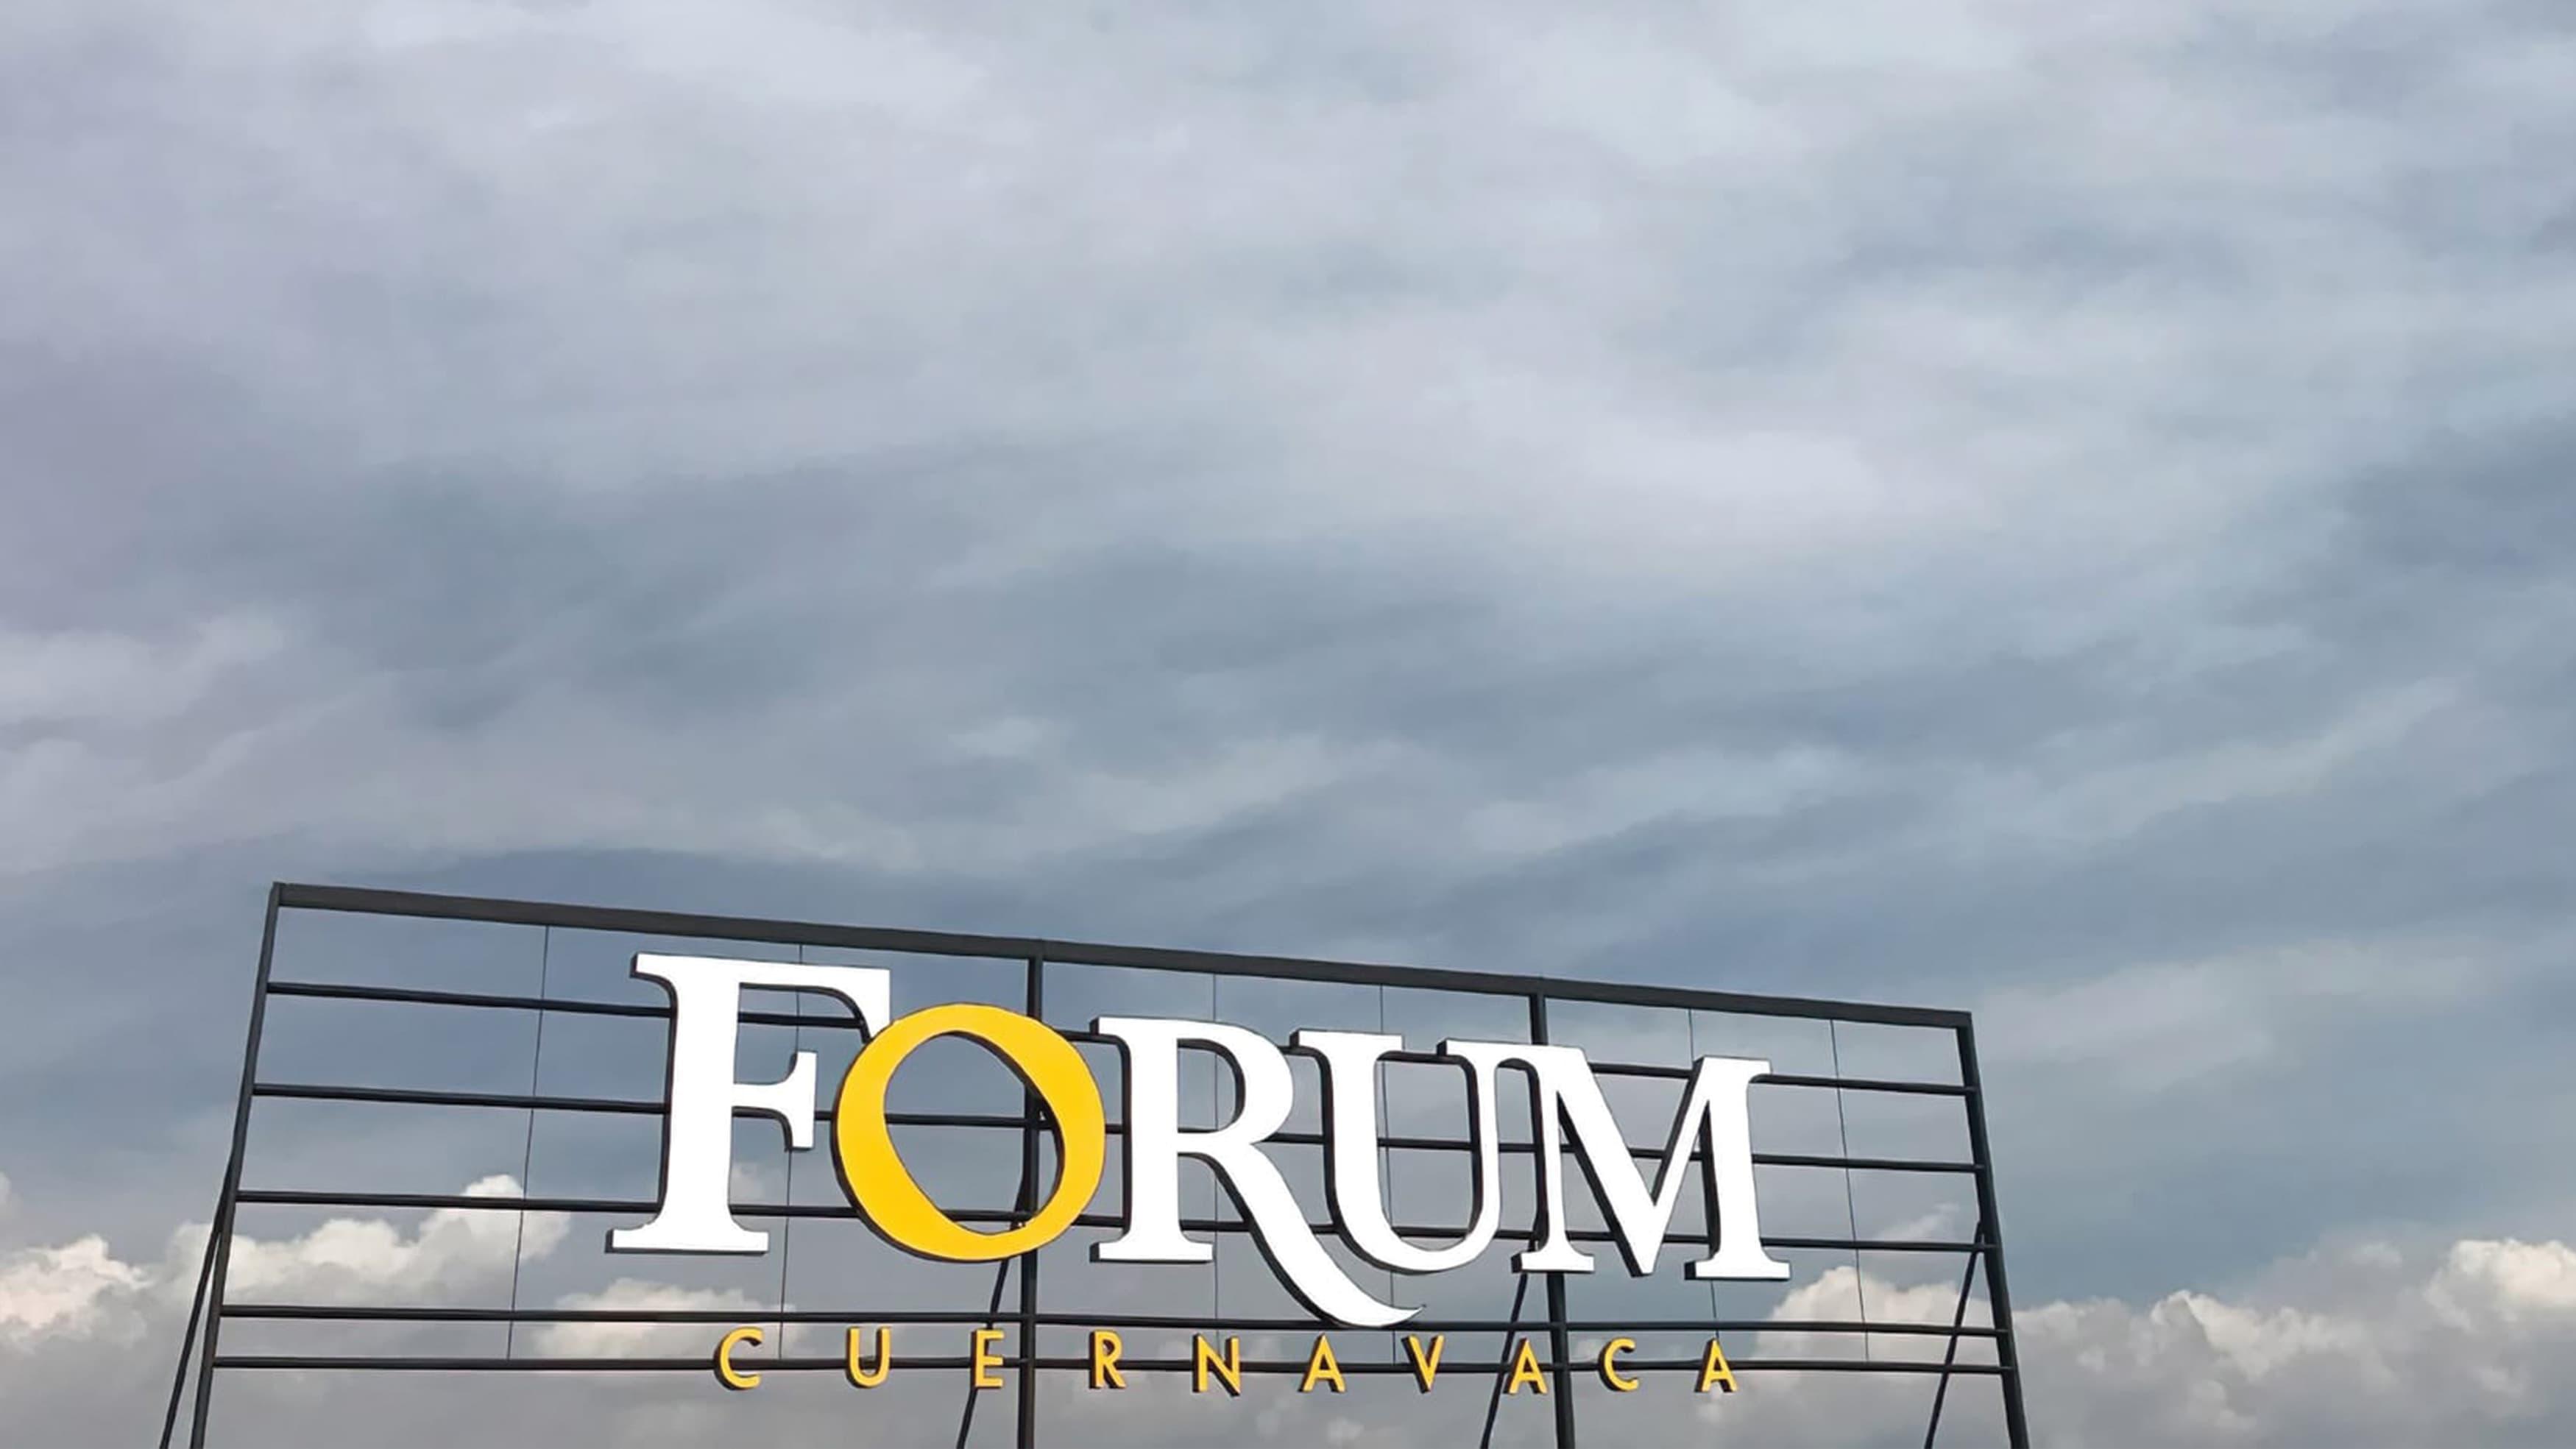 Forum Cuernavaca retail signage on rooftop in Mexico